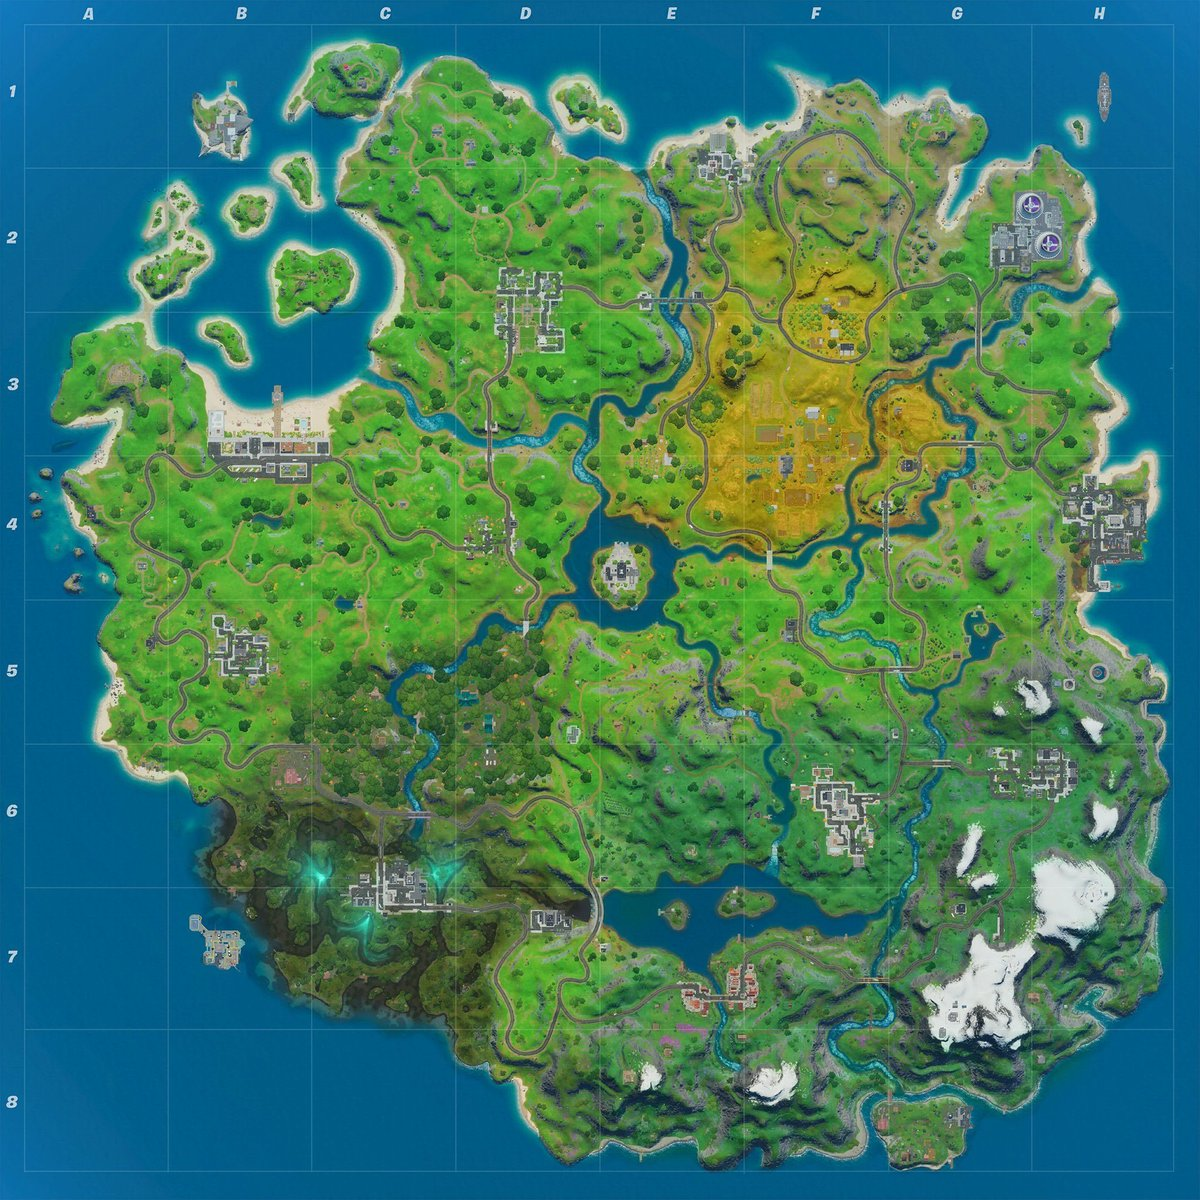 Fortnite Chapter 2, Season 2 map.